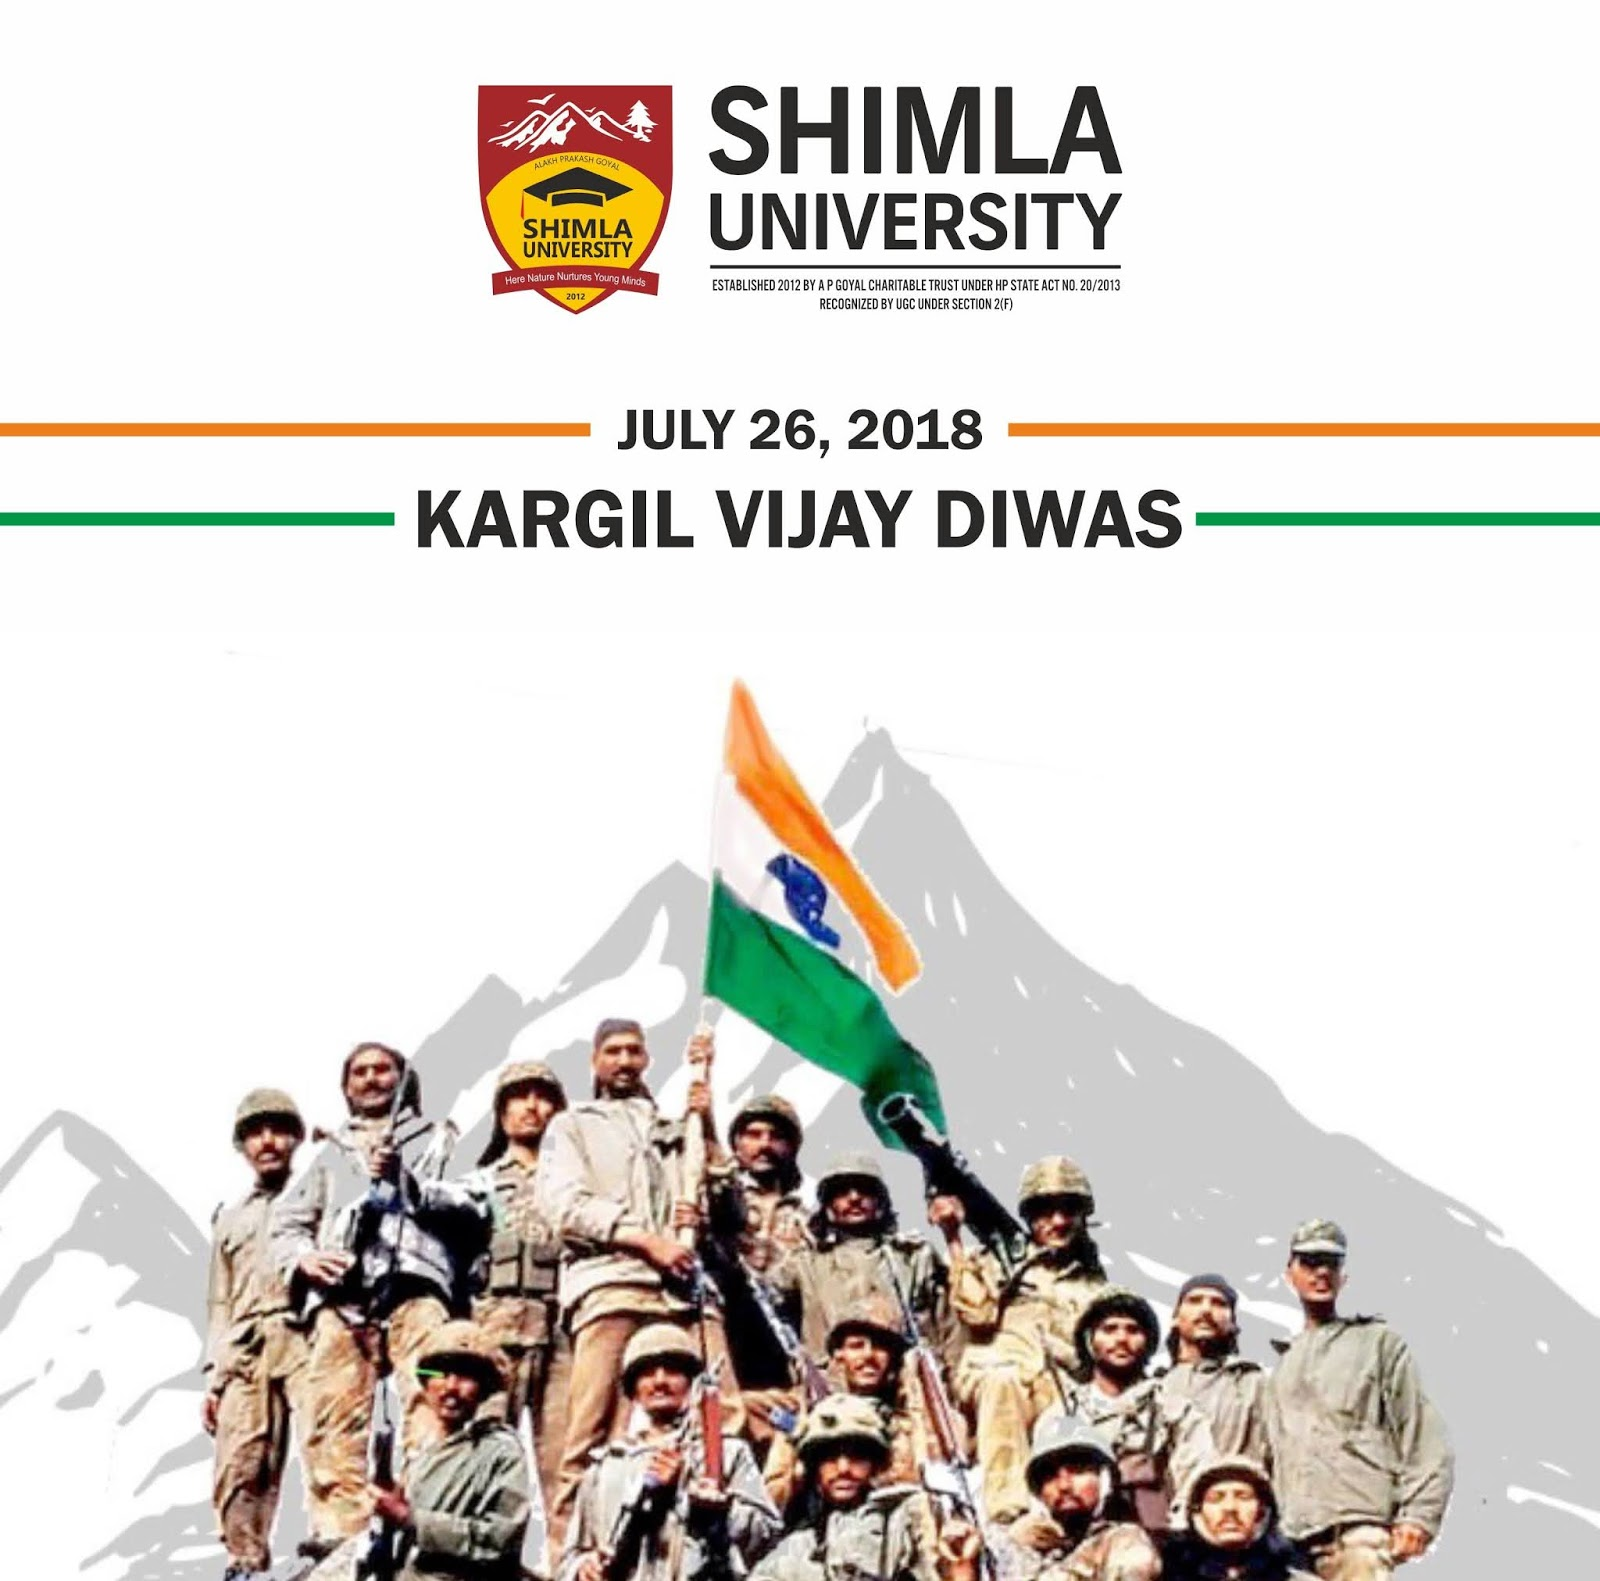 kargil vijay diwas image download